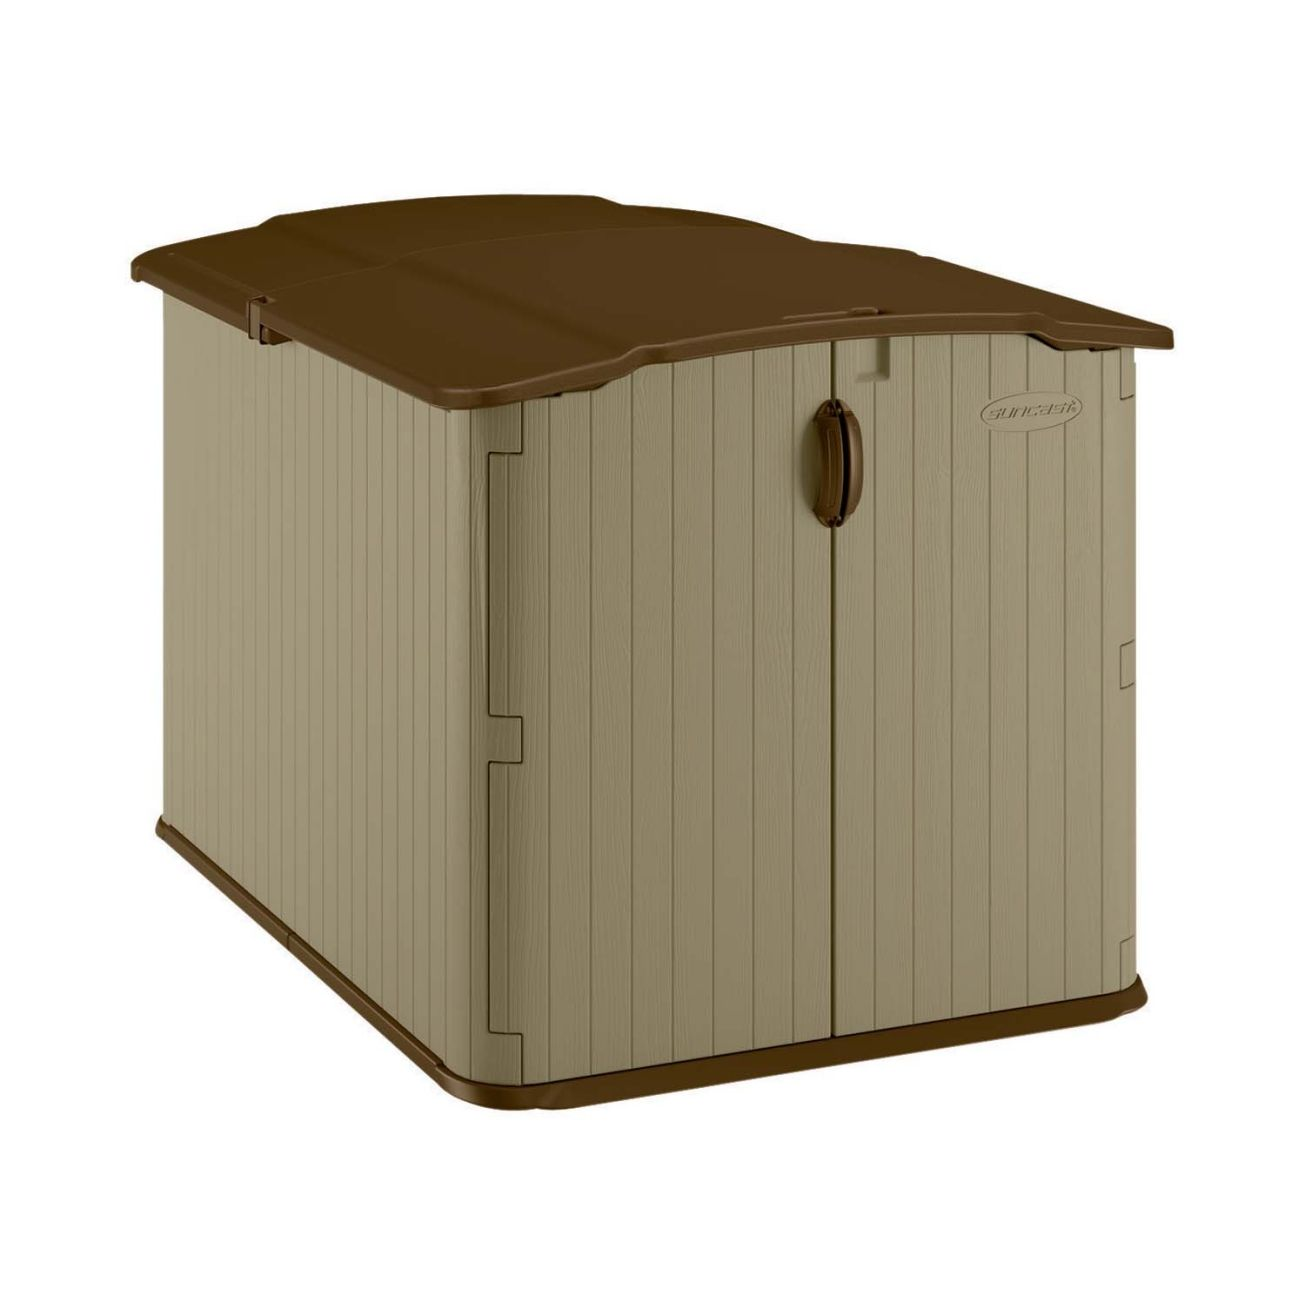 Suncast Glidetop Horizontal Shed Bms4900 Storage Sheds Resin Outdoor Storage Shed Storage Resin Storage